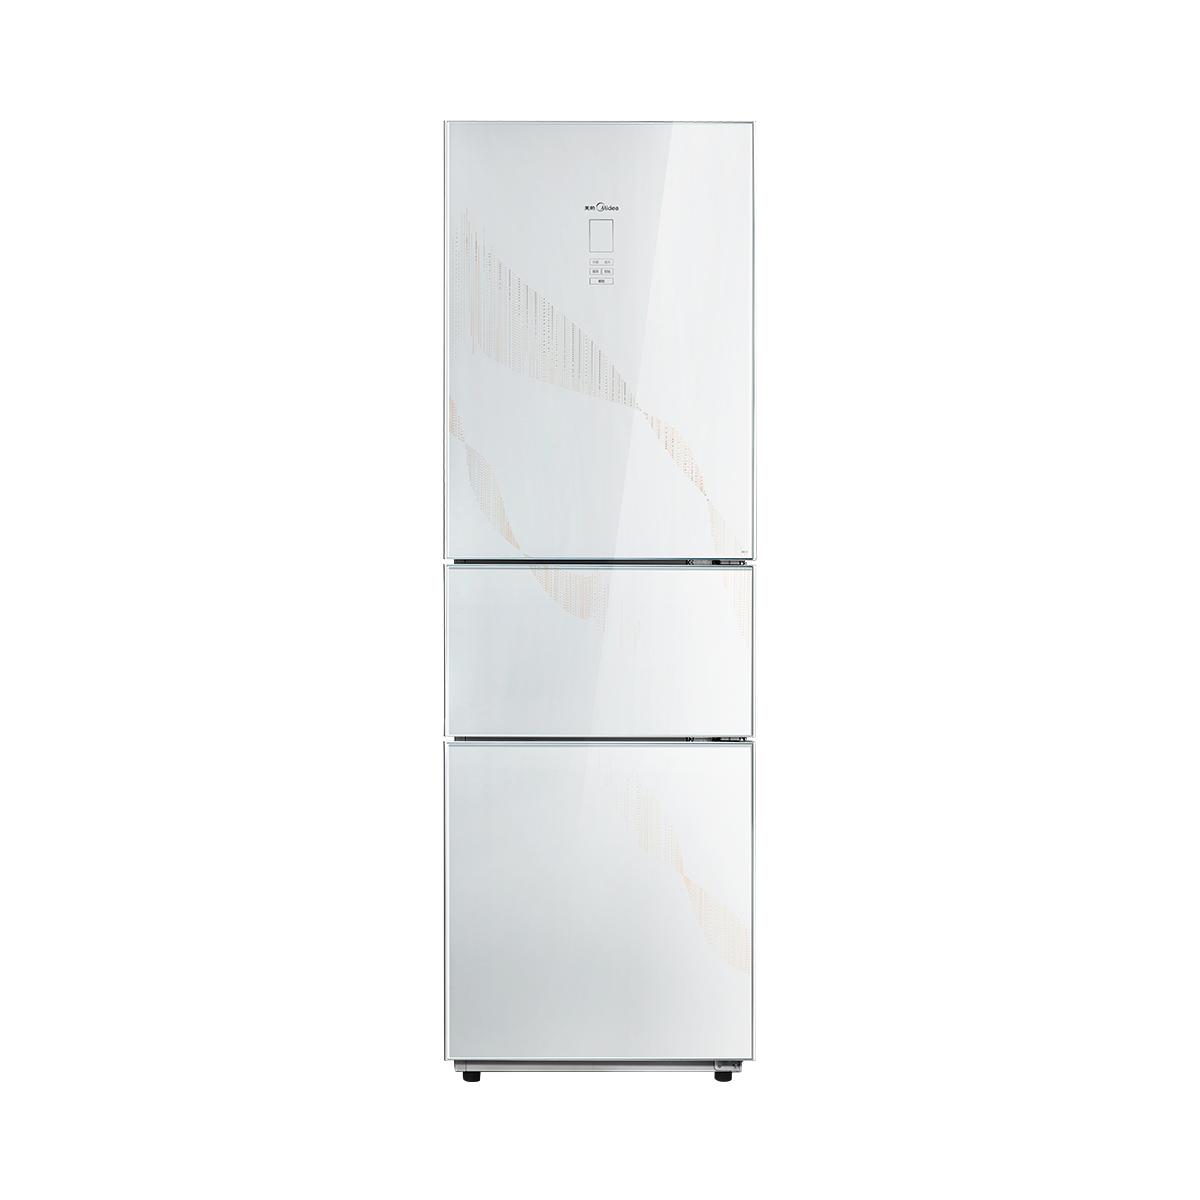 Midea/美的 BCD-235TGEM(E) 炫光白冰箱 说明书.pdf